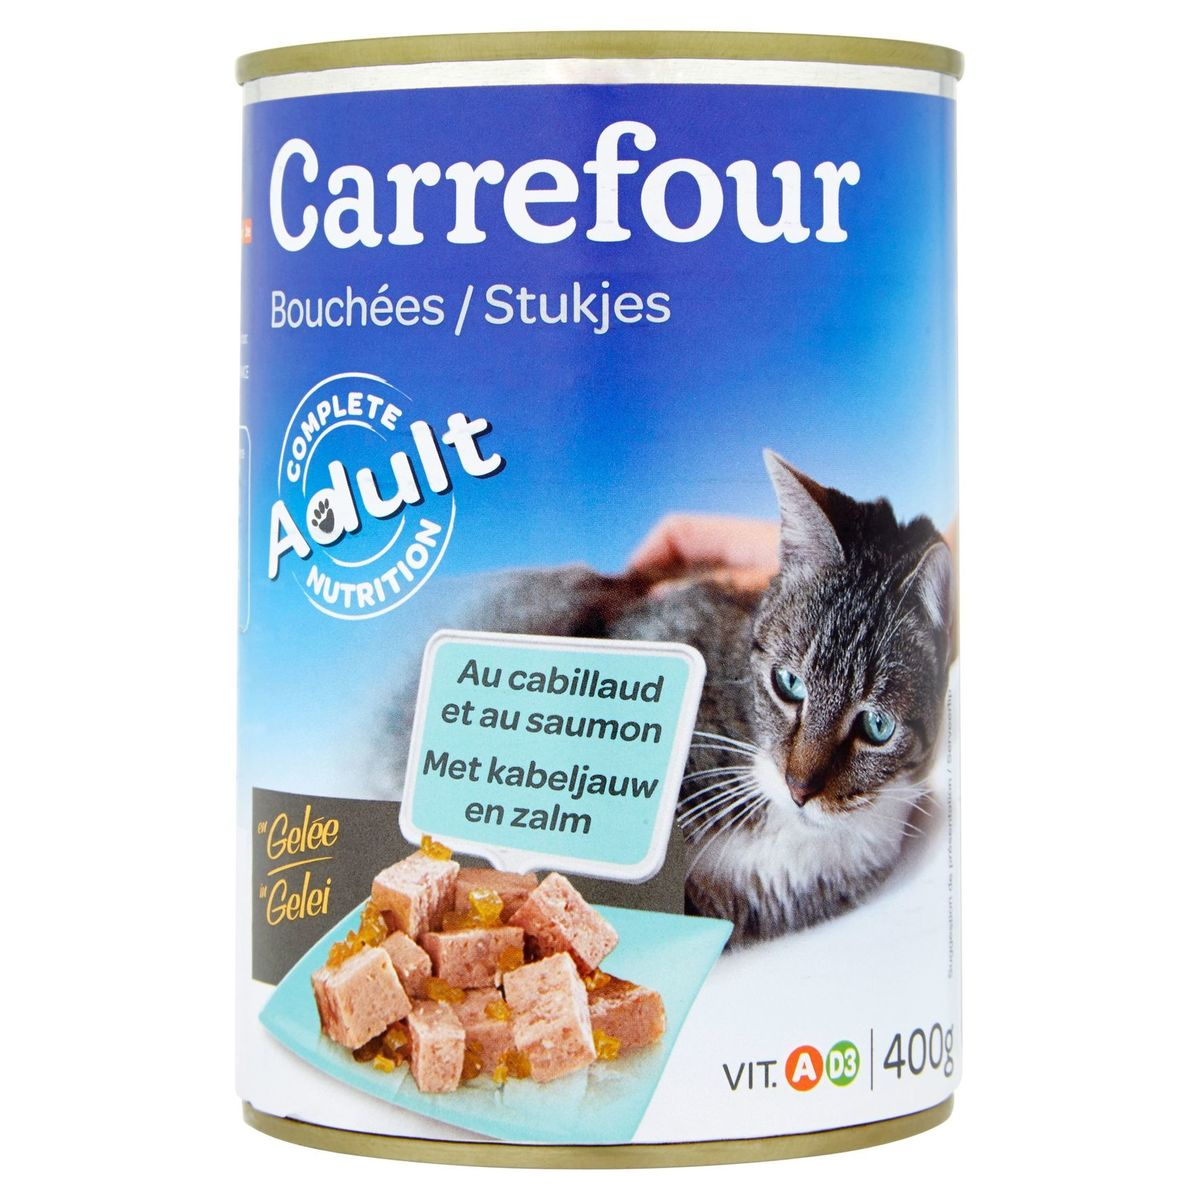 Carrefour Stukjes in Gelei met Kabeljauw en Zalm 400 g